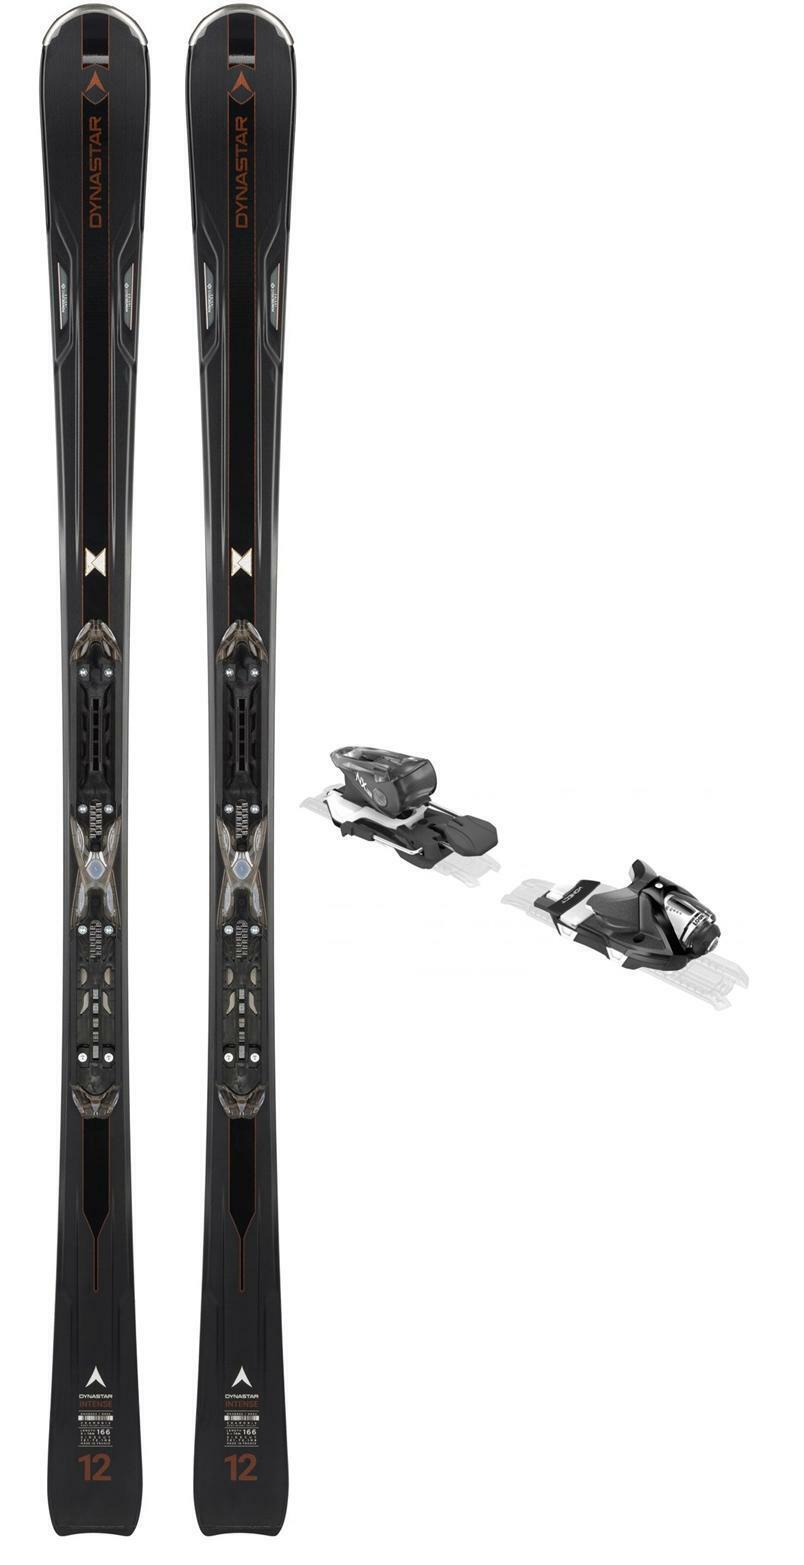 2020 Blizzard Black Pearl 82 159cm Skis /& Look SPX Dual WTR 90mm Black White Ski Bindings